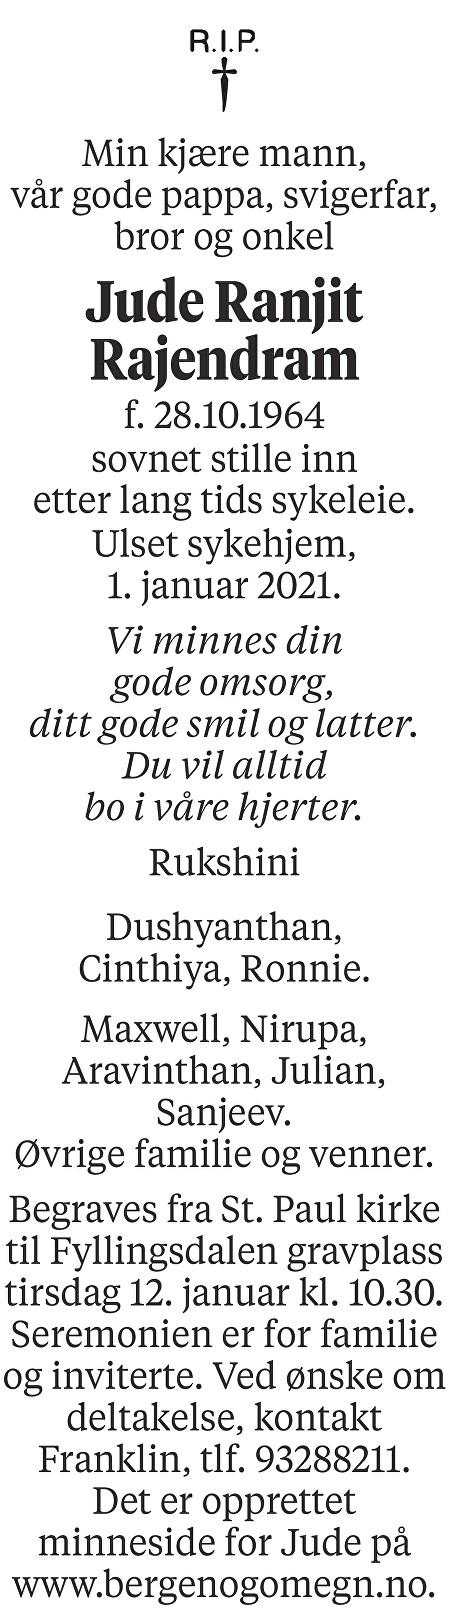 Jude Ranjit Rajendram Dødsannonse